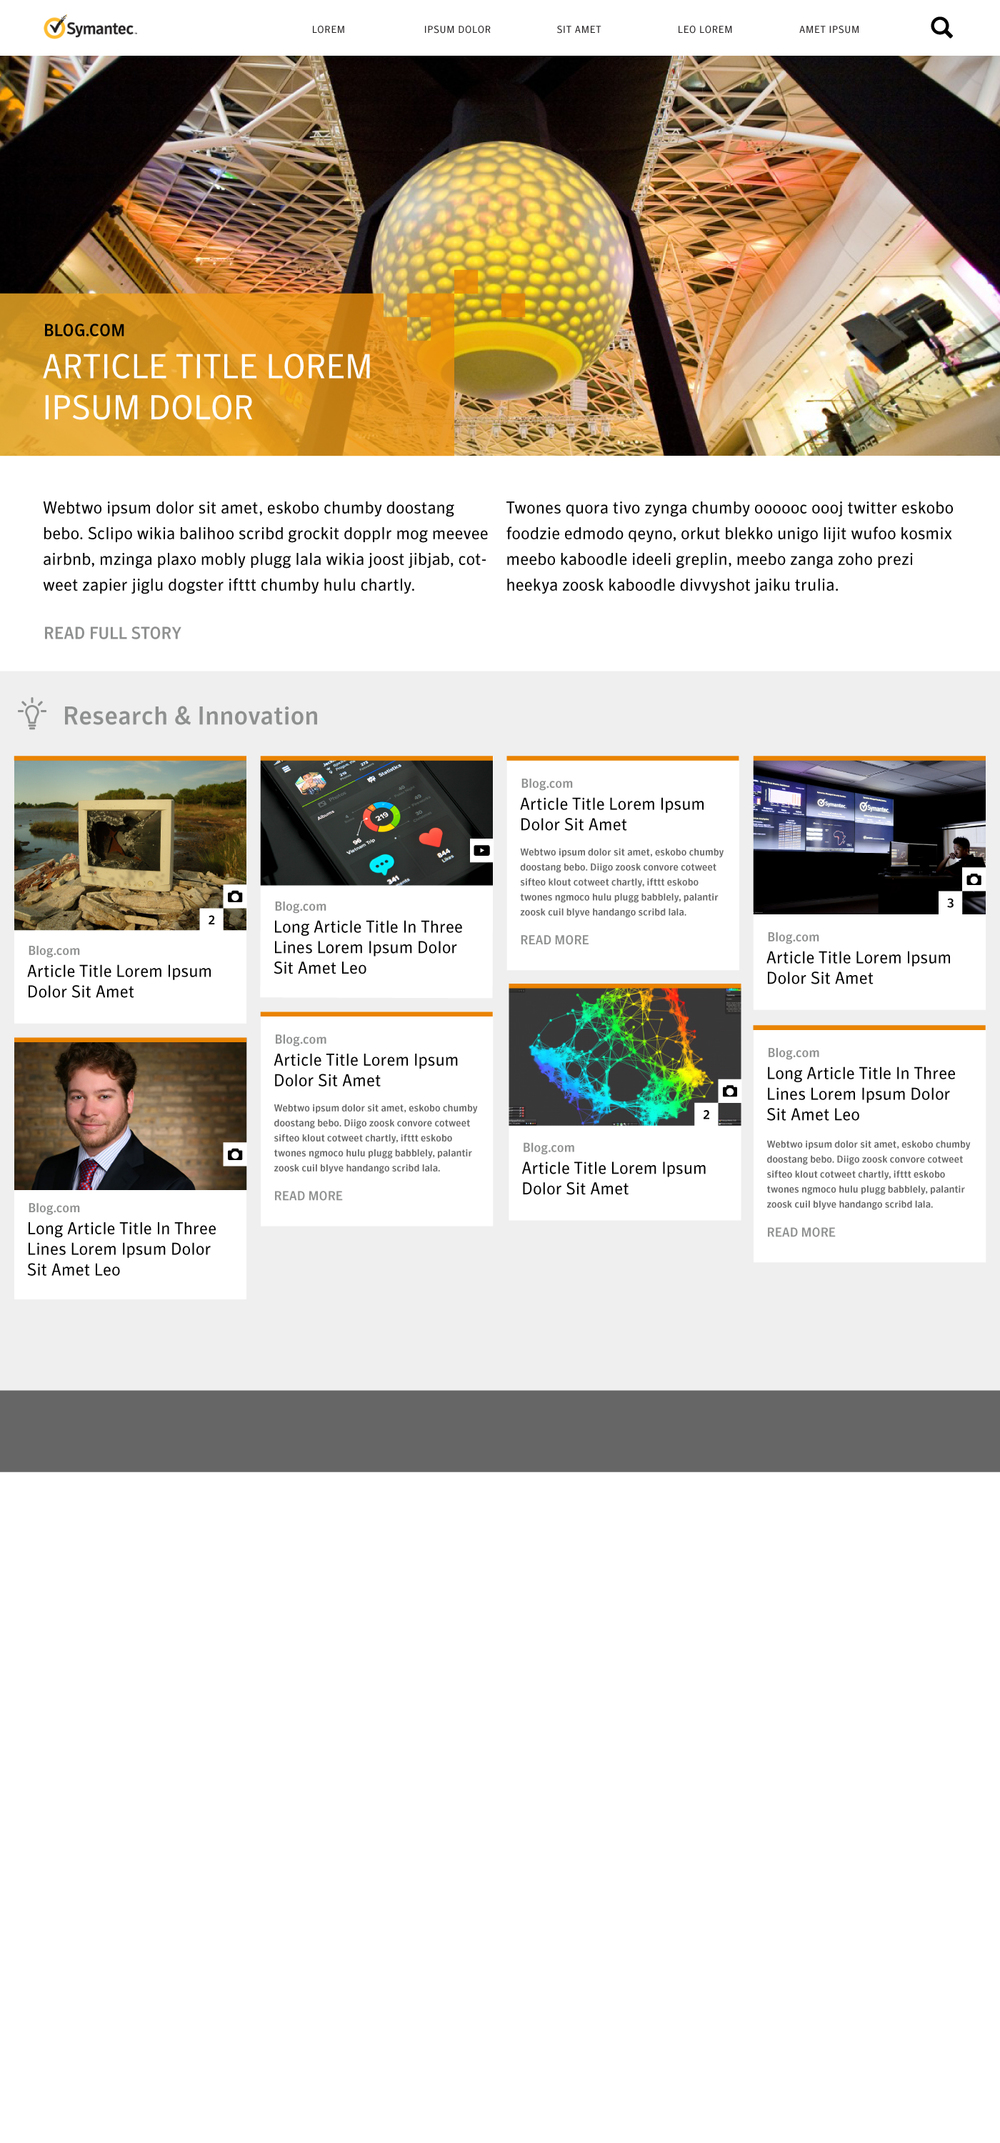 Symantec_Newsroom_01_04.jpg